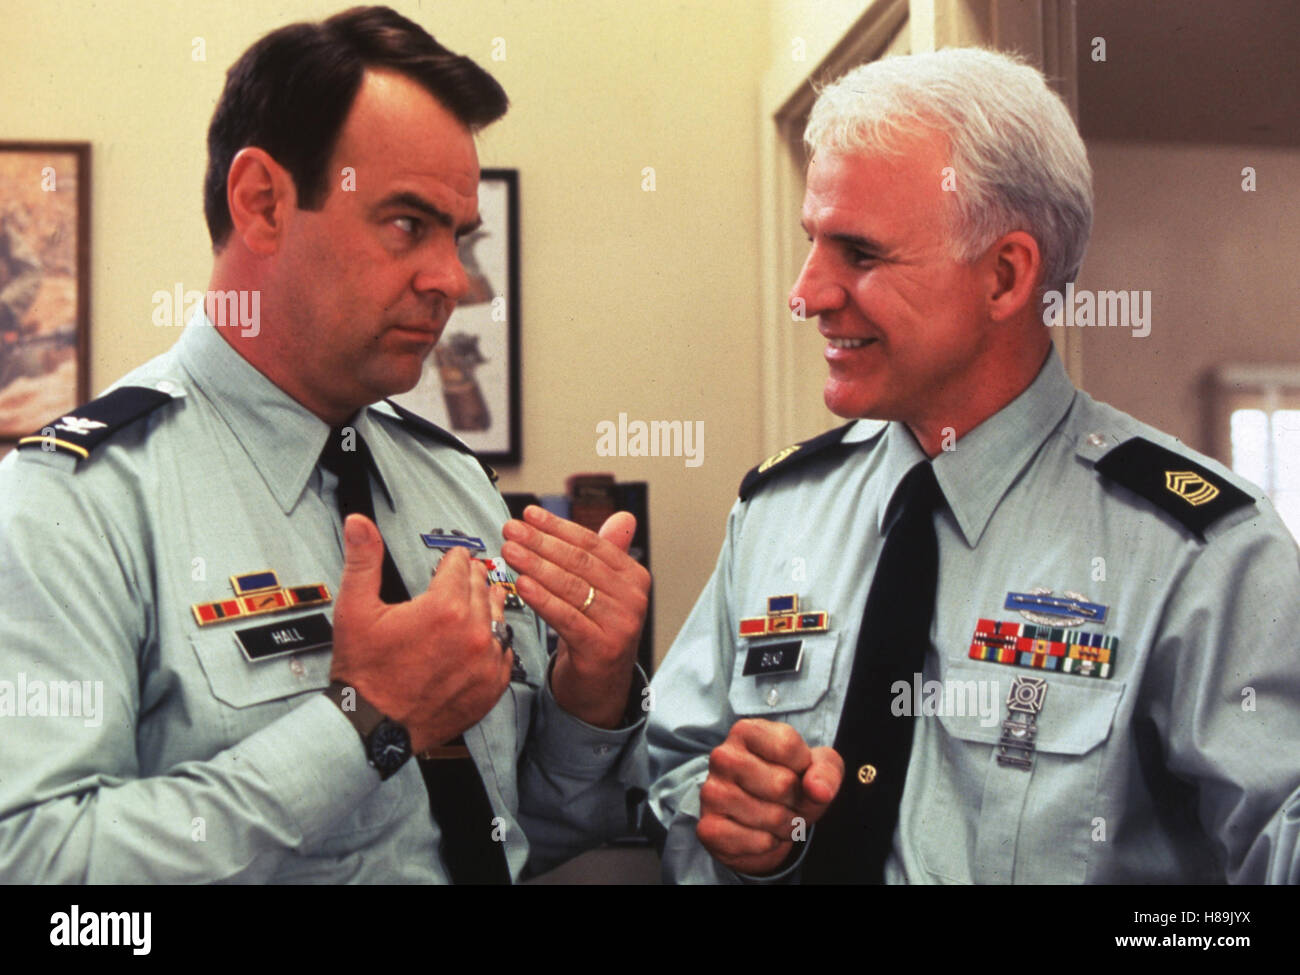 Immer Ärger mit Sergeant Bilko, (SGT. BILKO) USA 1996, Regie: Jonathan Lynn, DAN AYKROYD, STEVE MARTIN, Stichwort: - Stock Image